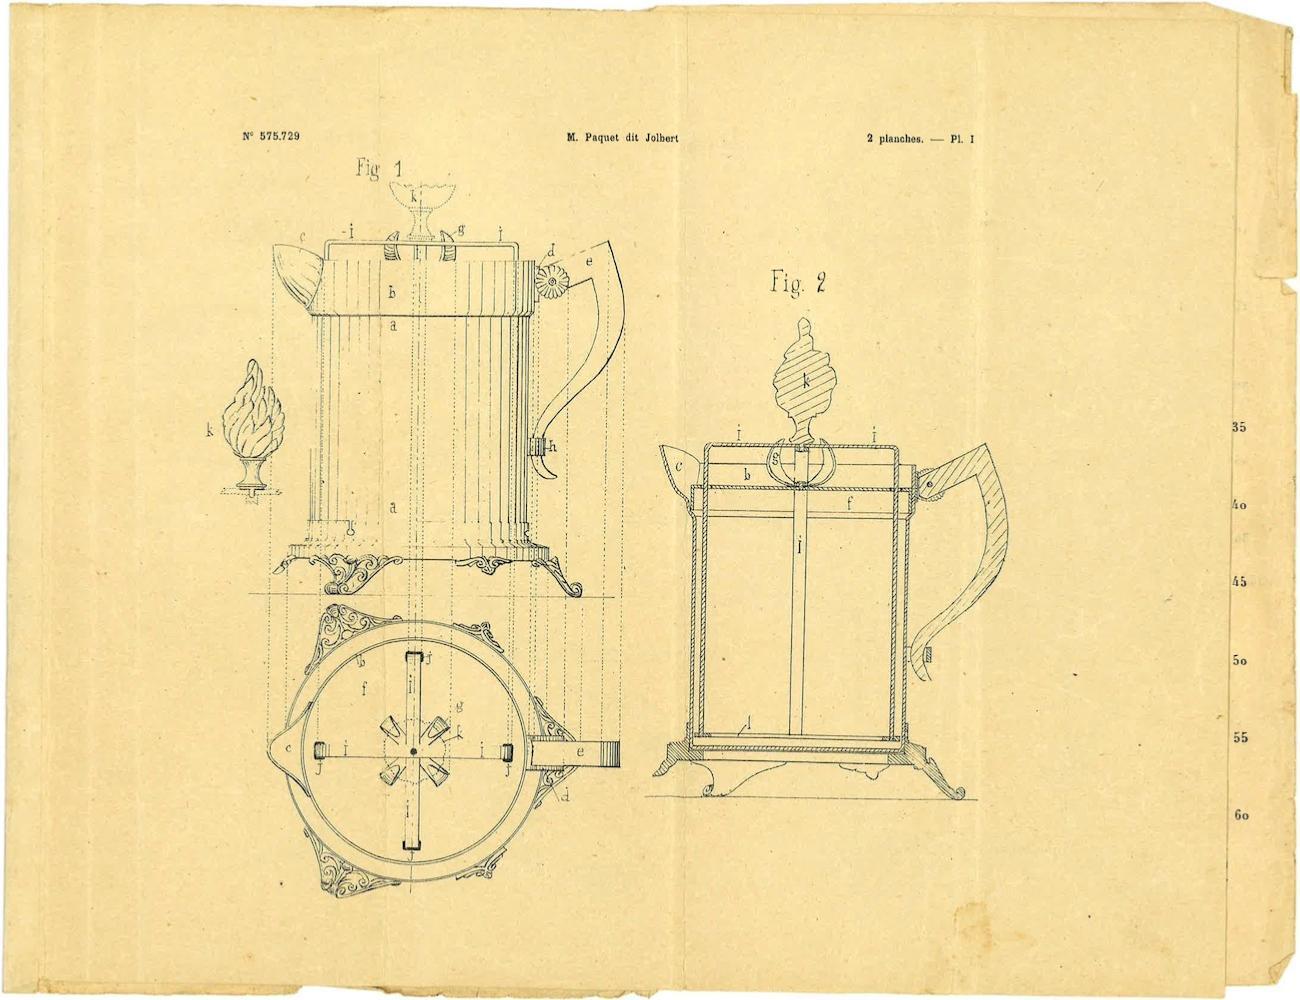 machine caf piston finest magnetic piston cylinder with. Black Bedroom Furniture Sets. Home Design Ideas